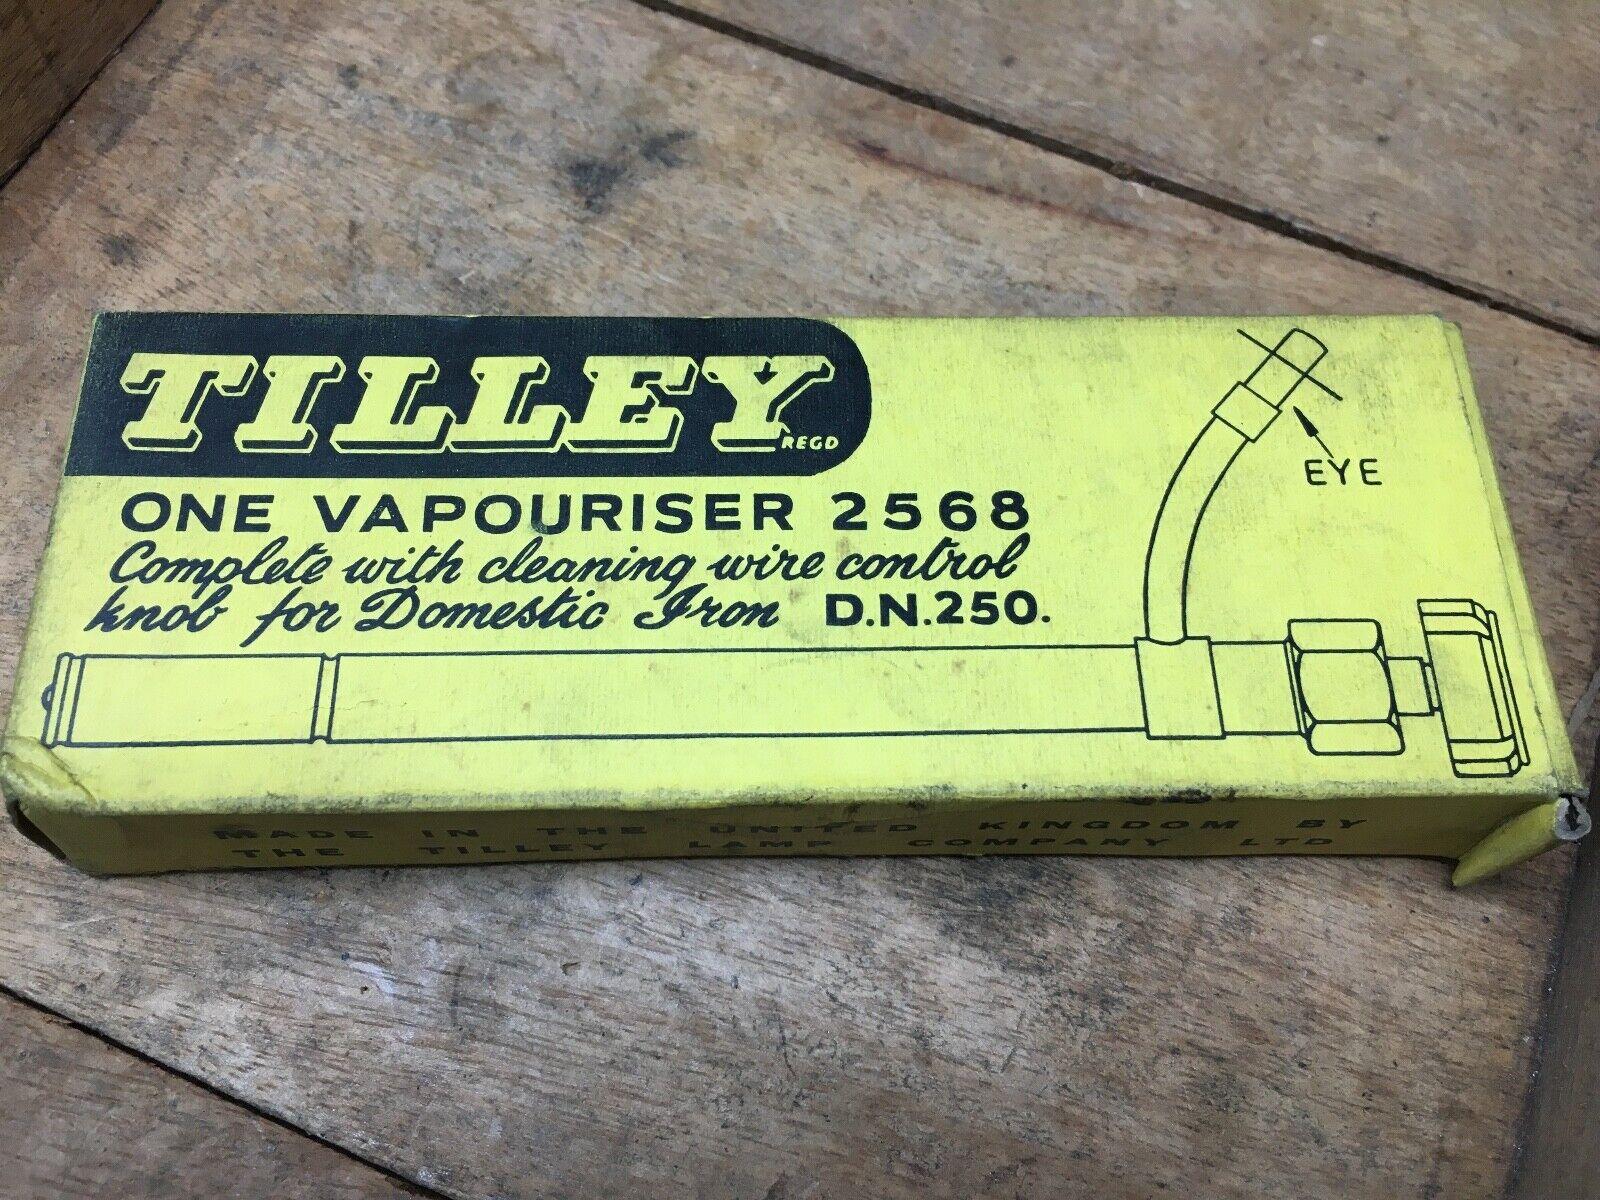 Vintage Nos Tilley Lampada 2568 Vaporizzatore per Dn250 Domestic Ferro Paraffina